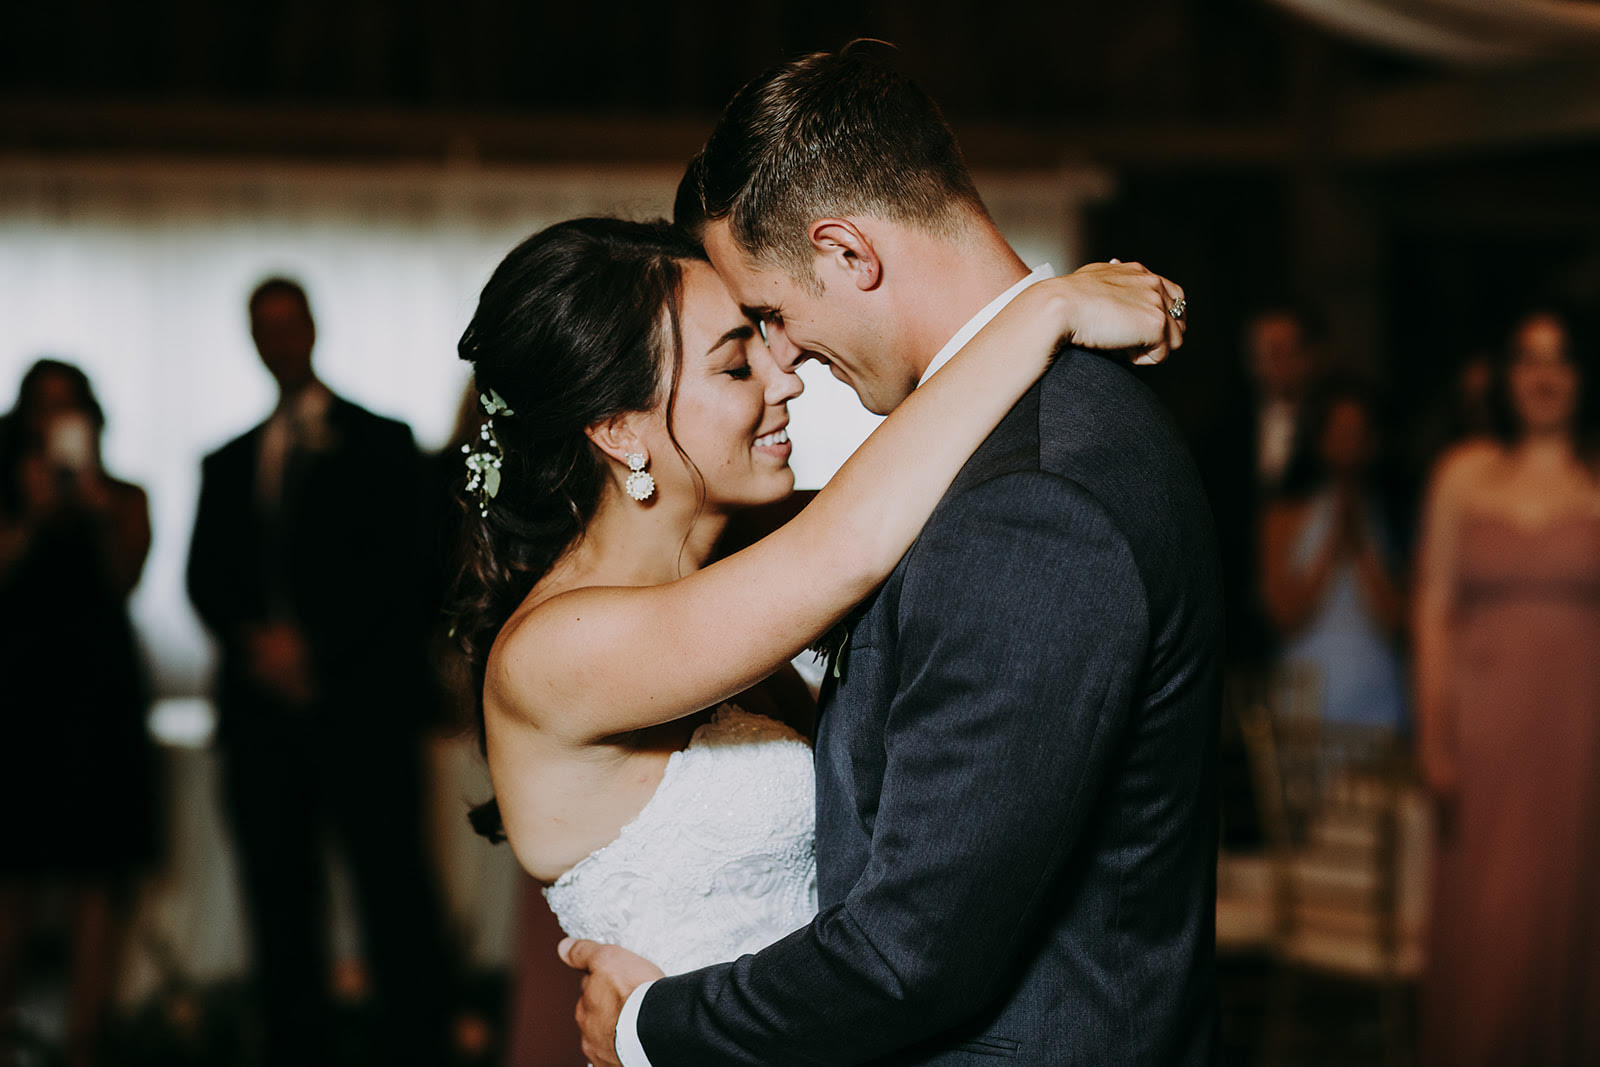 ivory-and-beau-wedding-dress-bridal-boutique-breanna-wedding-3.jpg